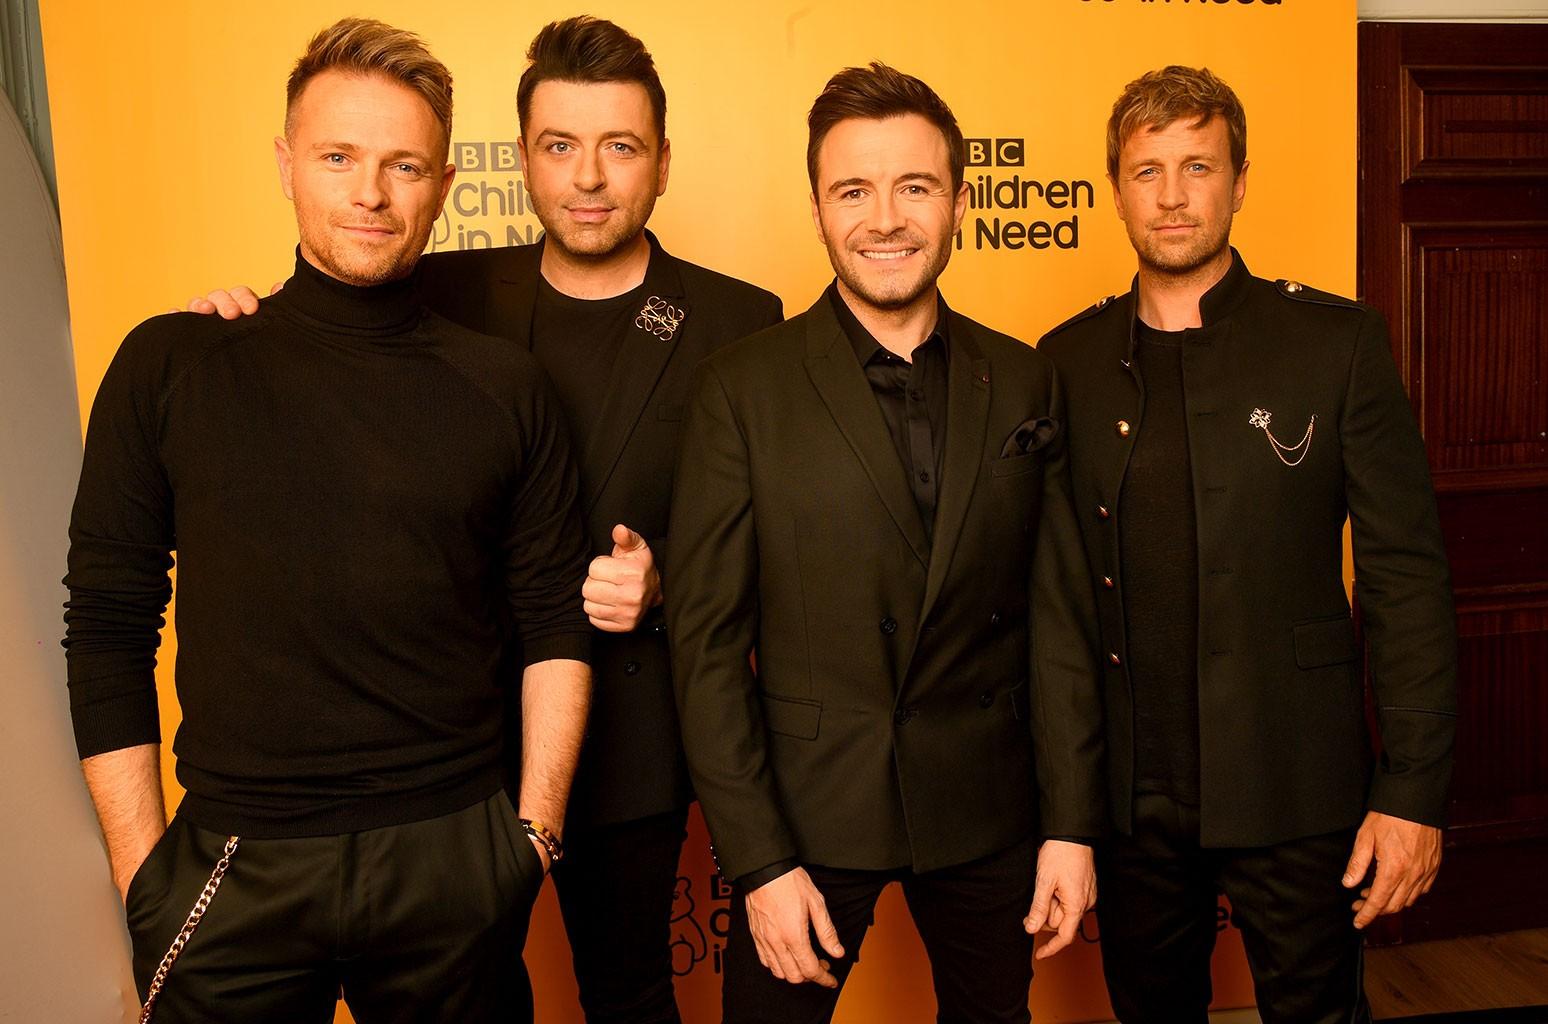 Nicky Byrne, Mark Feehily, Shane Filan and Kian Egan of Westlife